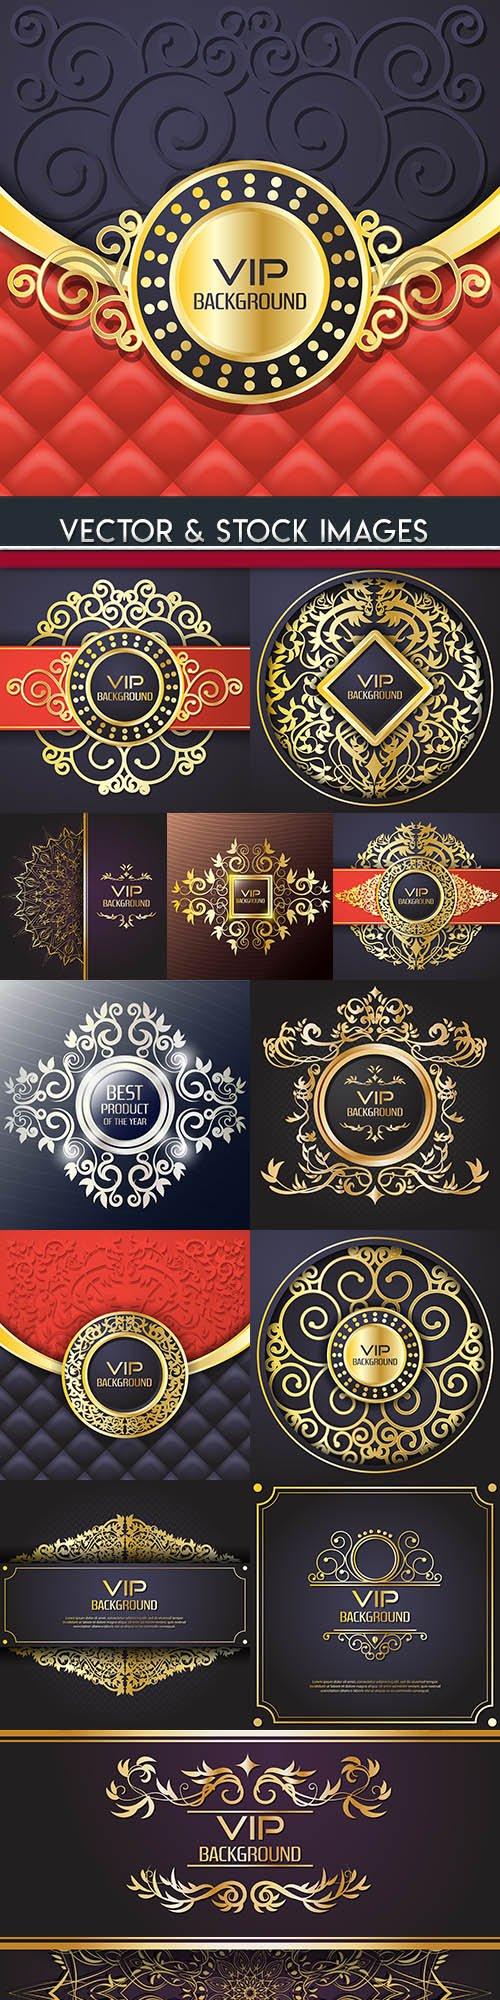 Luxury vip golden vintage elegant background